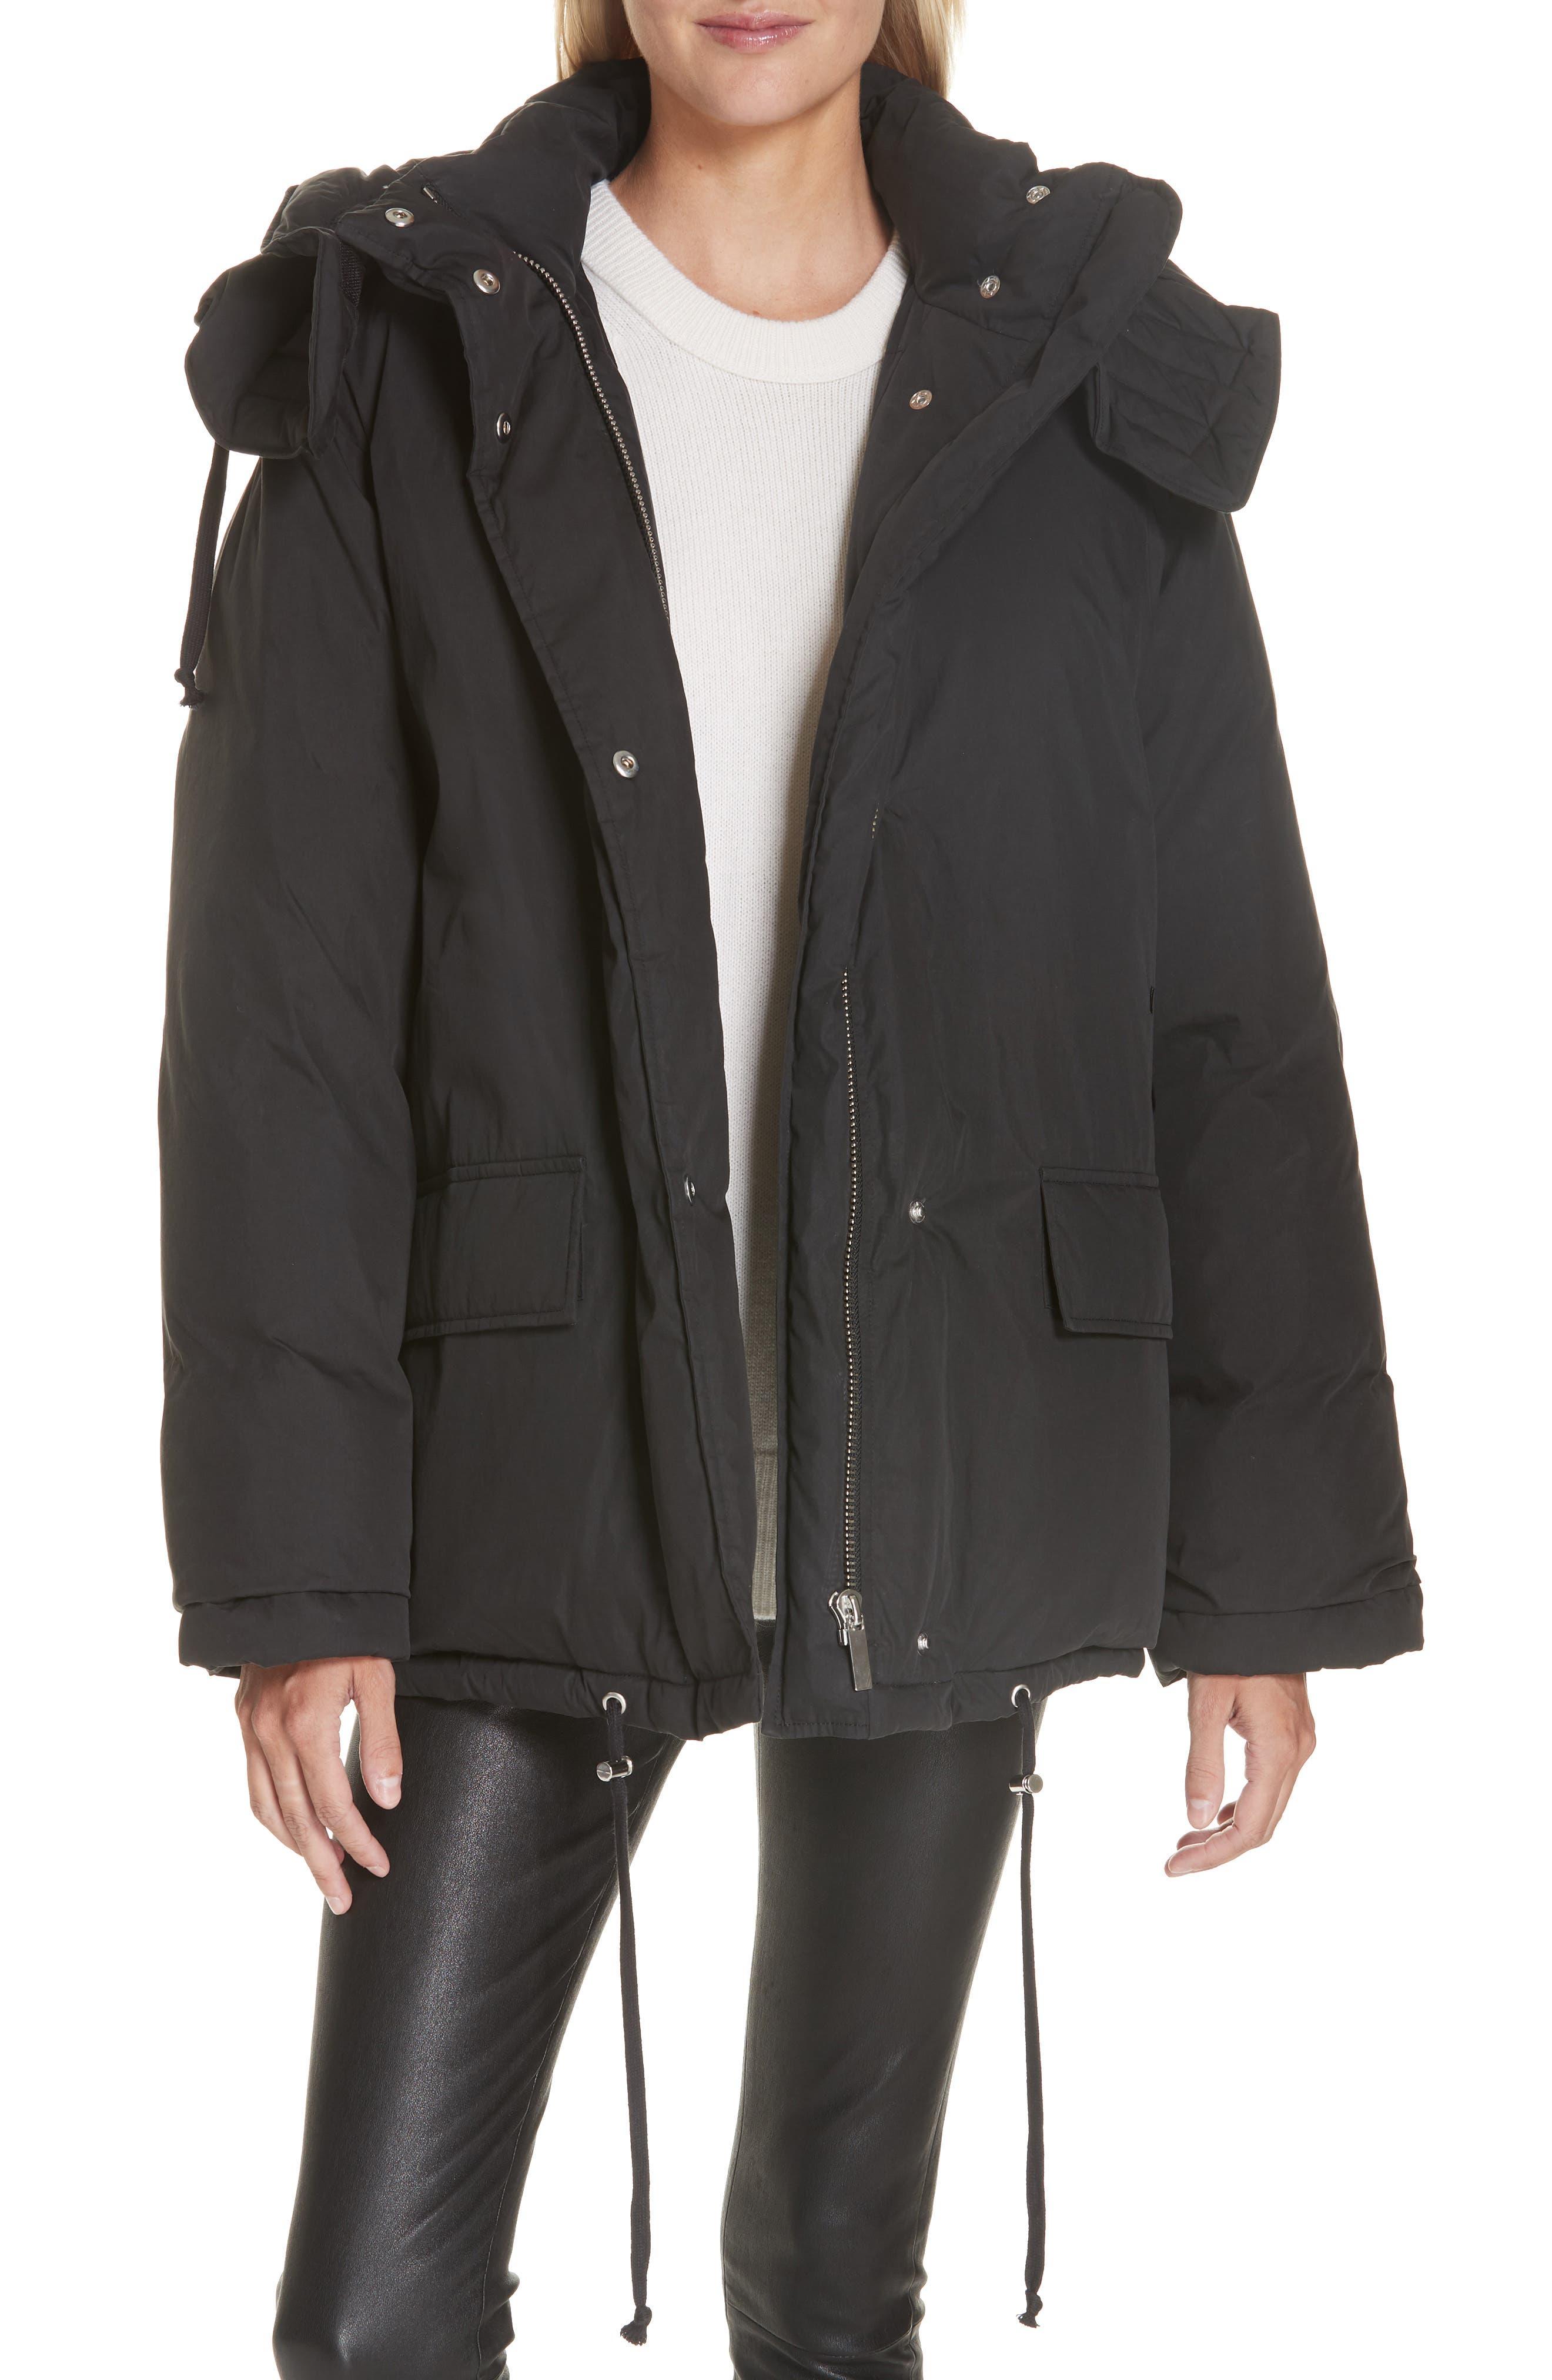 HELMUT LANG, Removable Hood Puffer Jacket, Main thumbnail 1, color, 001